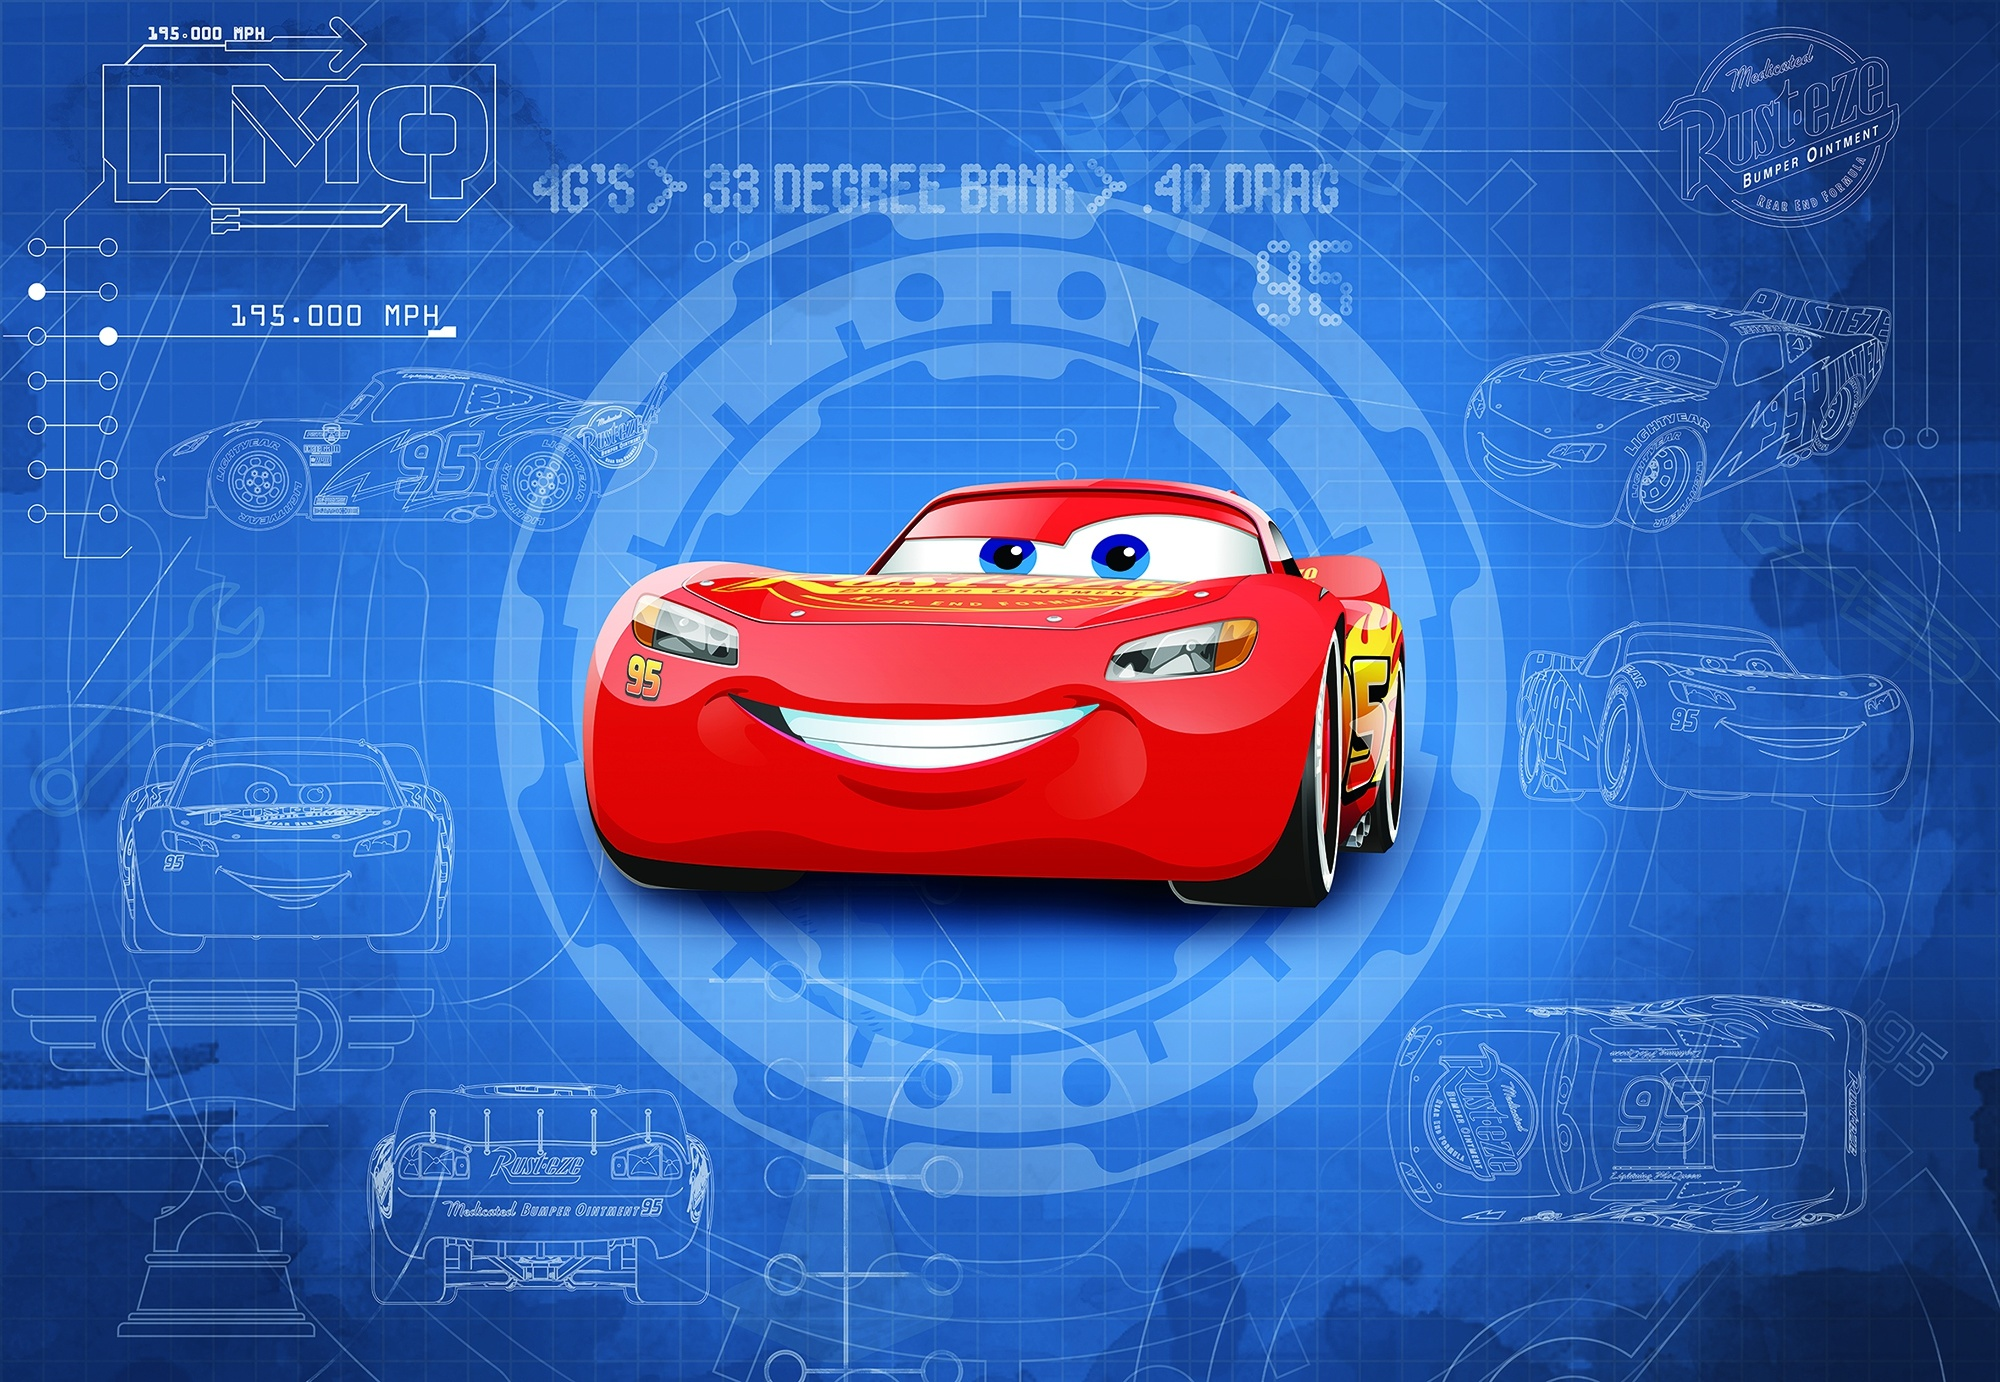 Disney Edition 4 Kinderbehang Komar - Kinderkamer behang  CARS3 BLUEPRINT